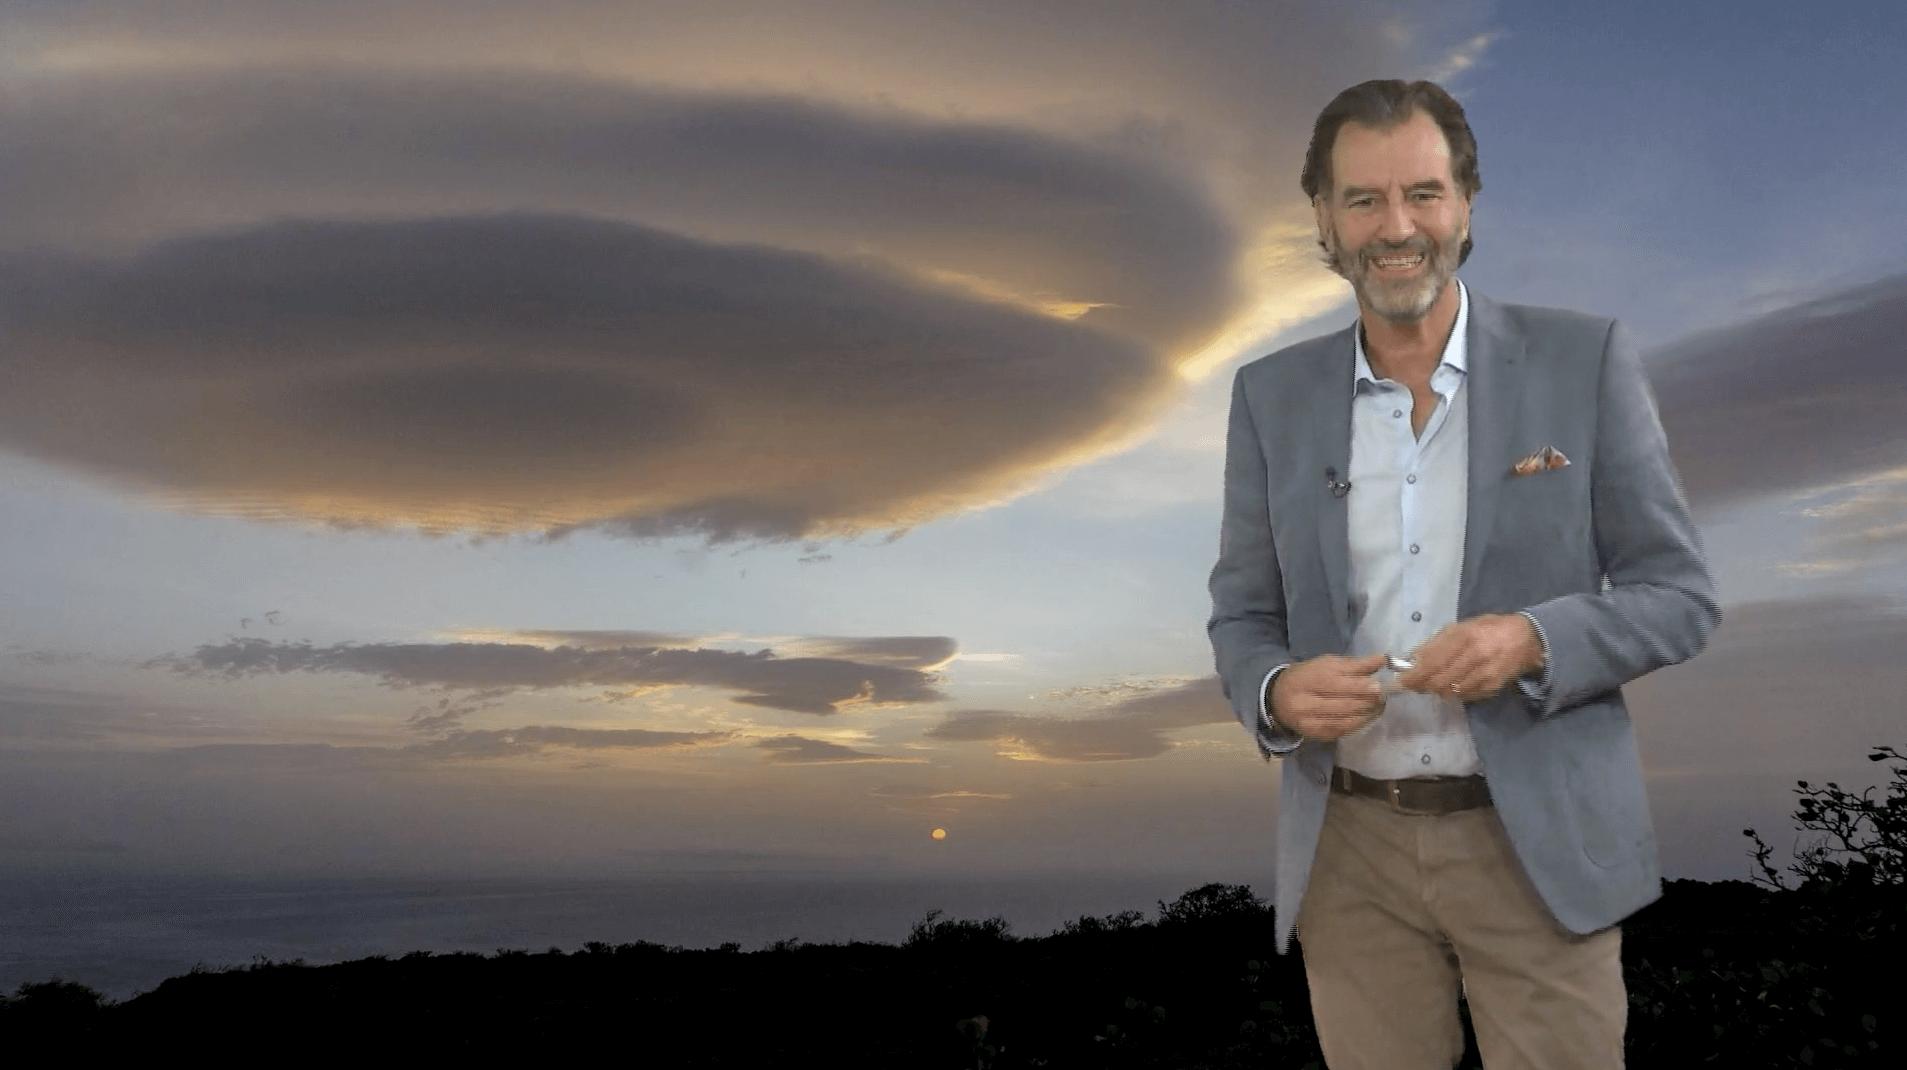 Wilde Wetter Welt 21. Oktober 2020